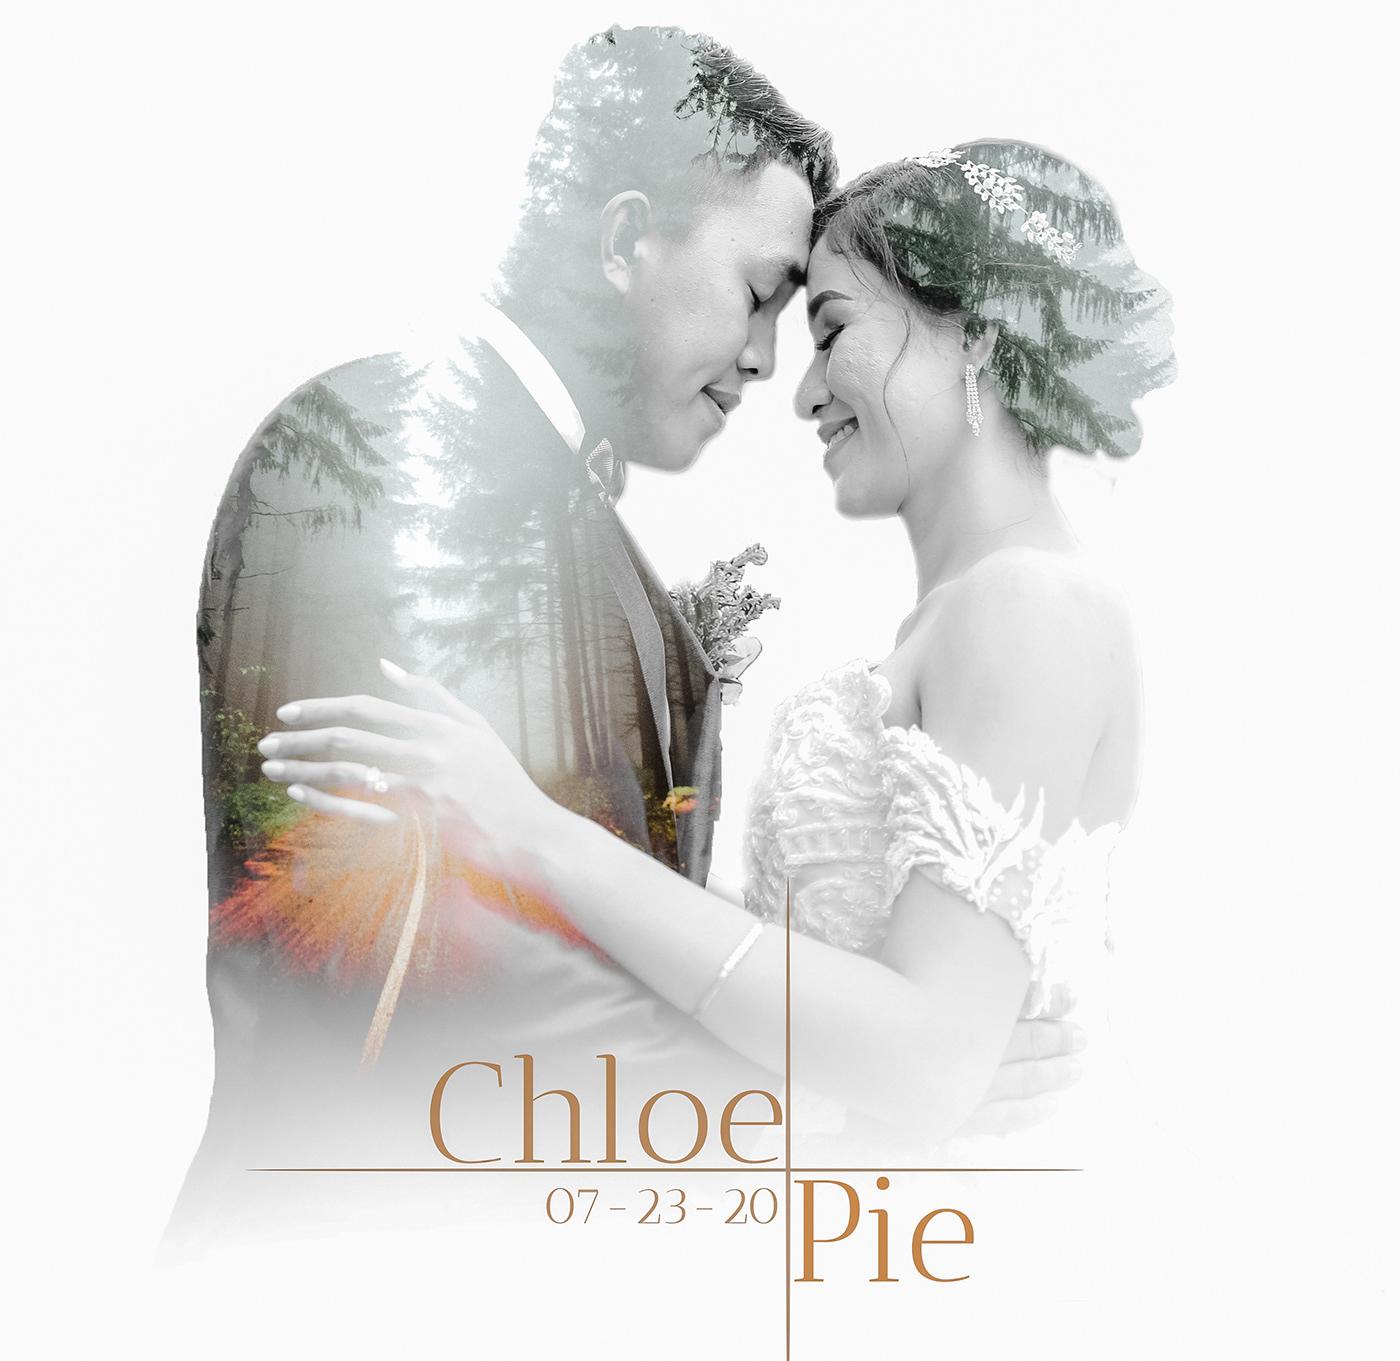 Image may contain: kiss, bride and wedding dress